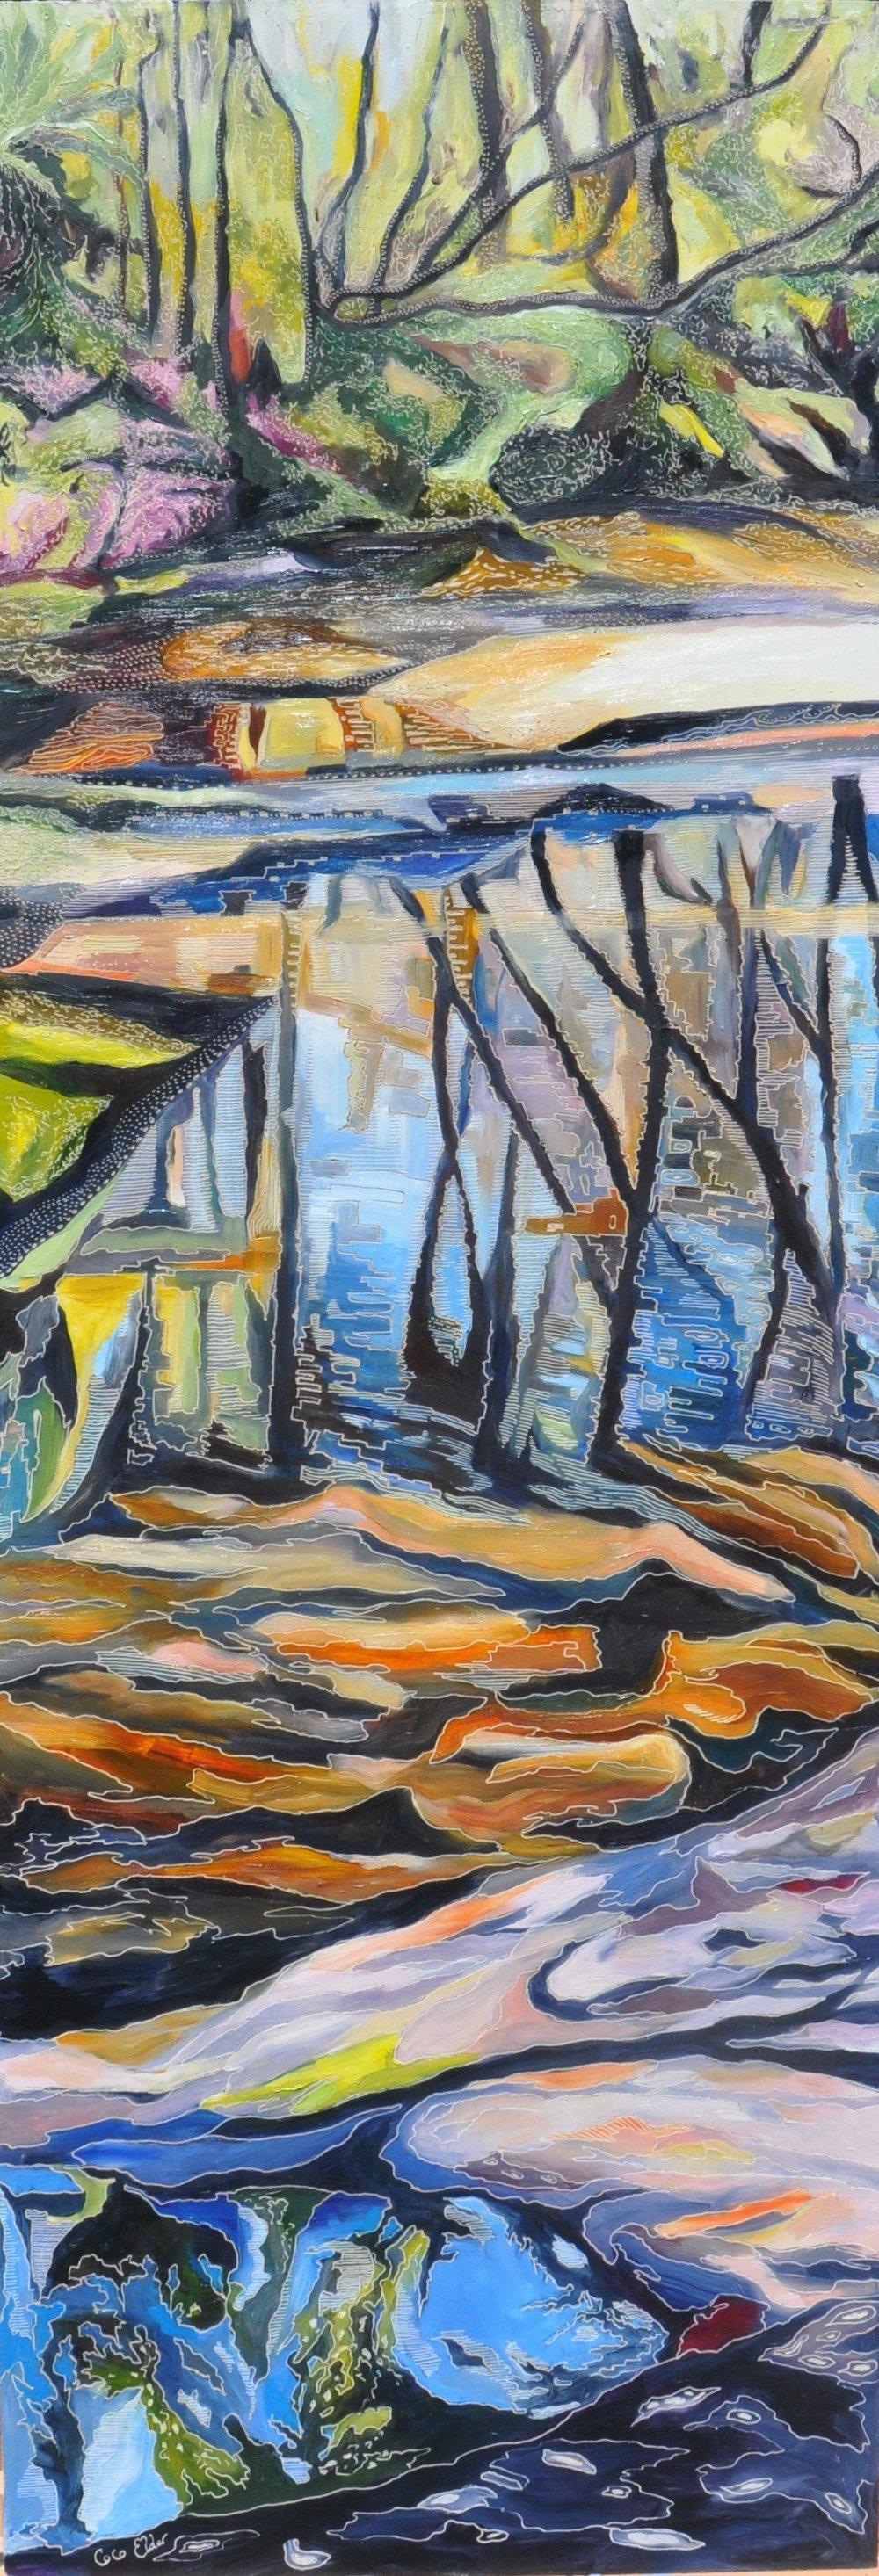 Title: Sliver of Salvation Creek Medium: oil on board carved Dimensions: 40 cm x 120 cm  SOLD